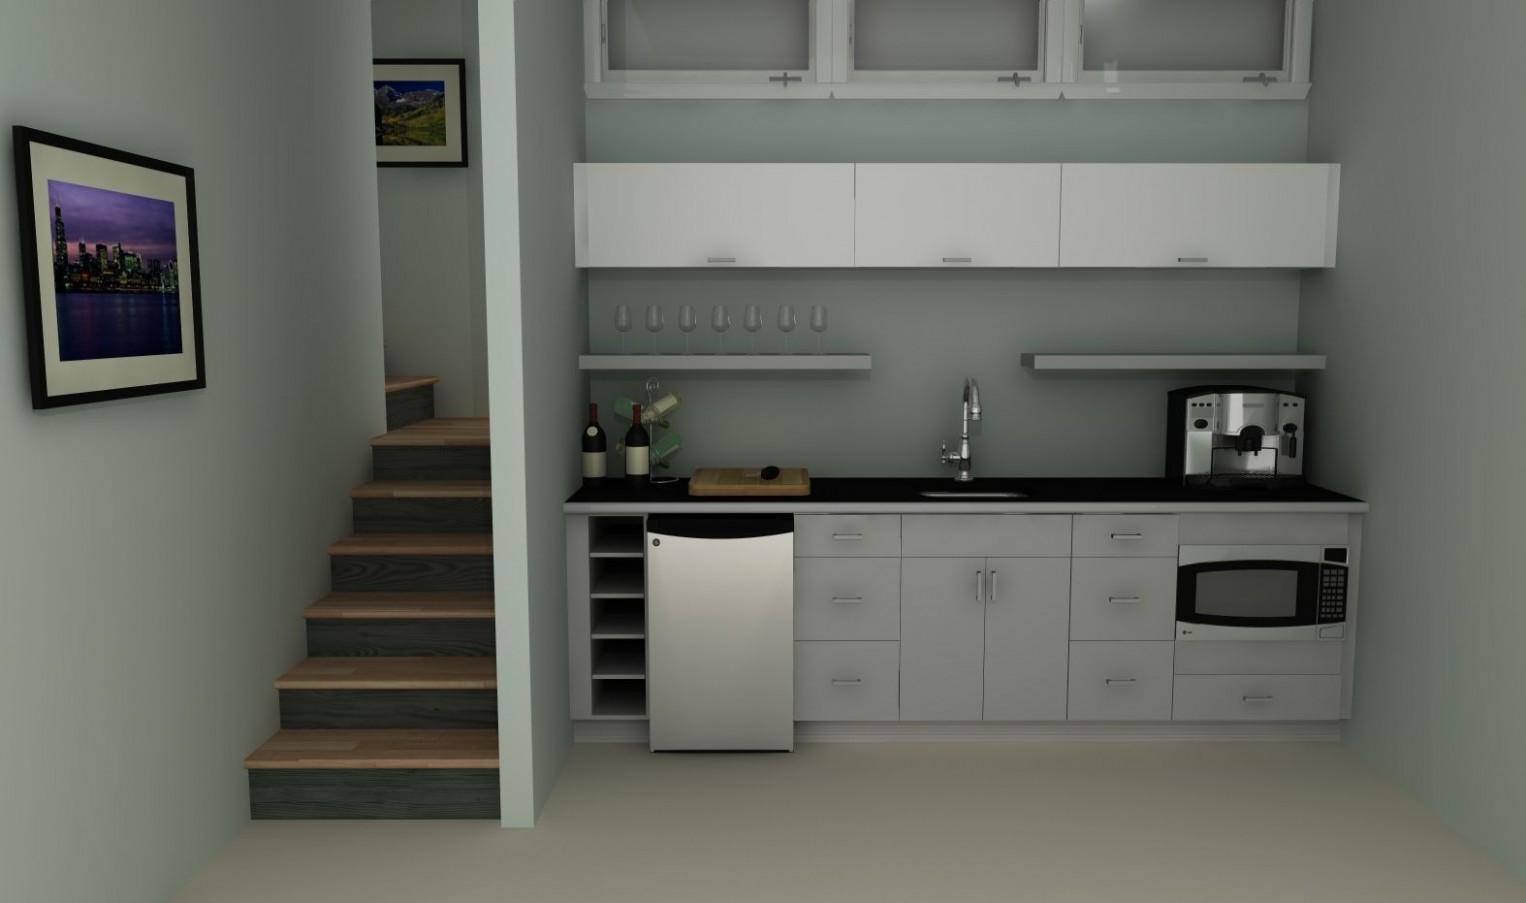 Beautiful Room ideas kitchenette designs photos for Hall, Kitchen  - Bedroom Kitchenette Ideas